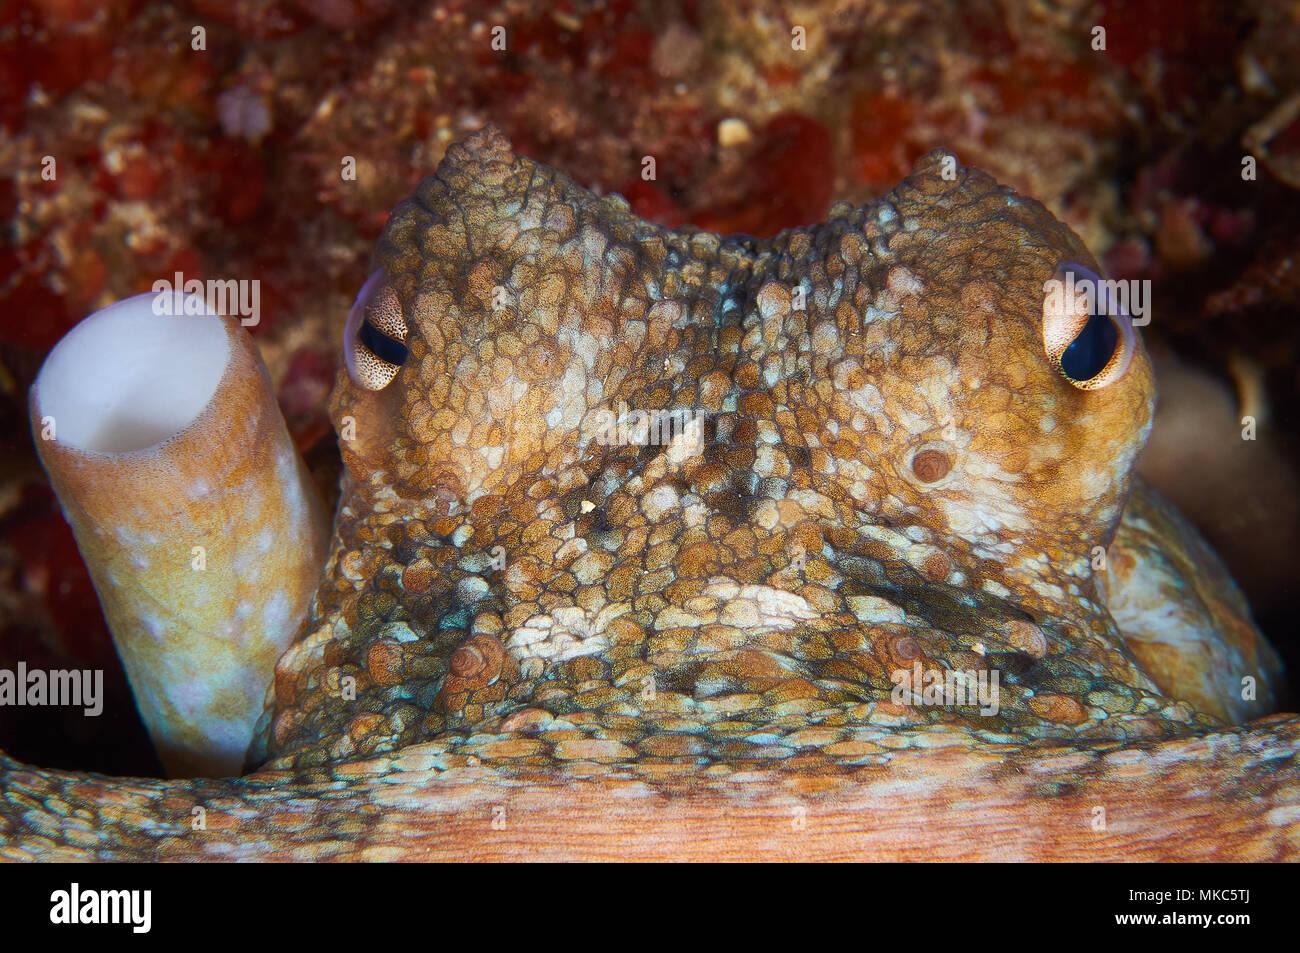 Common octopus (Octopus vulgaris) portrait in Mediterranean Sea (Formentera, Balearic Islands, Spain) - Stock Image